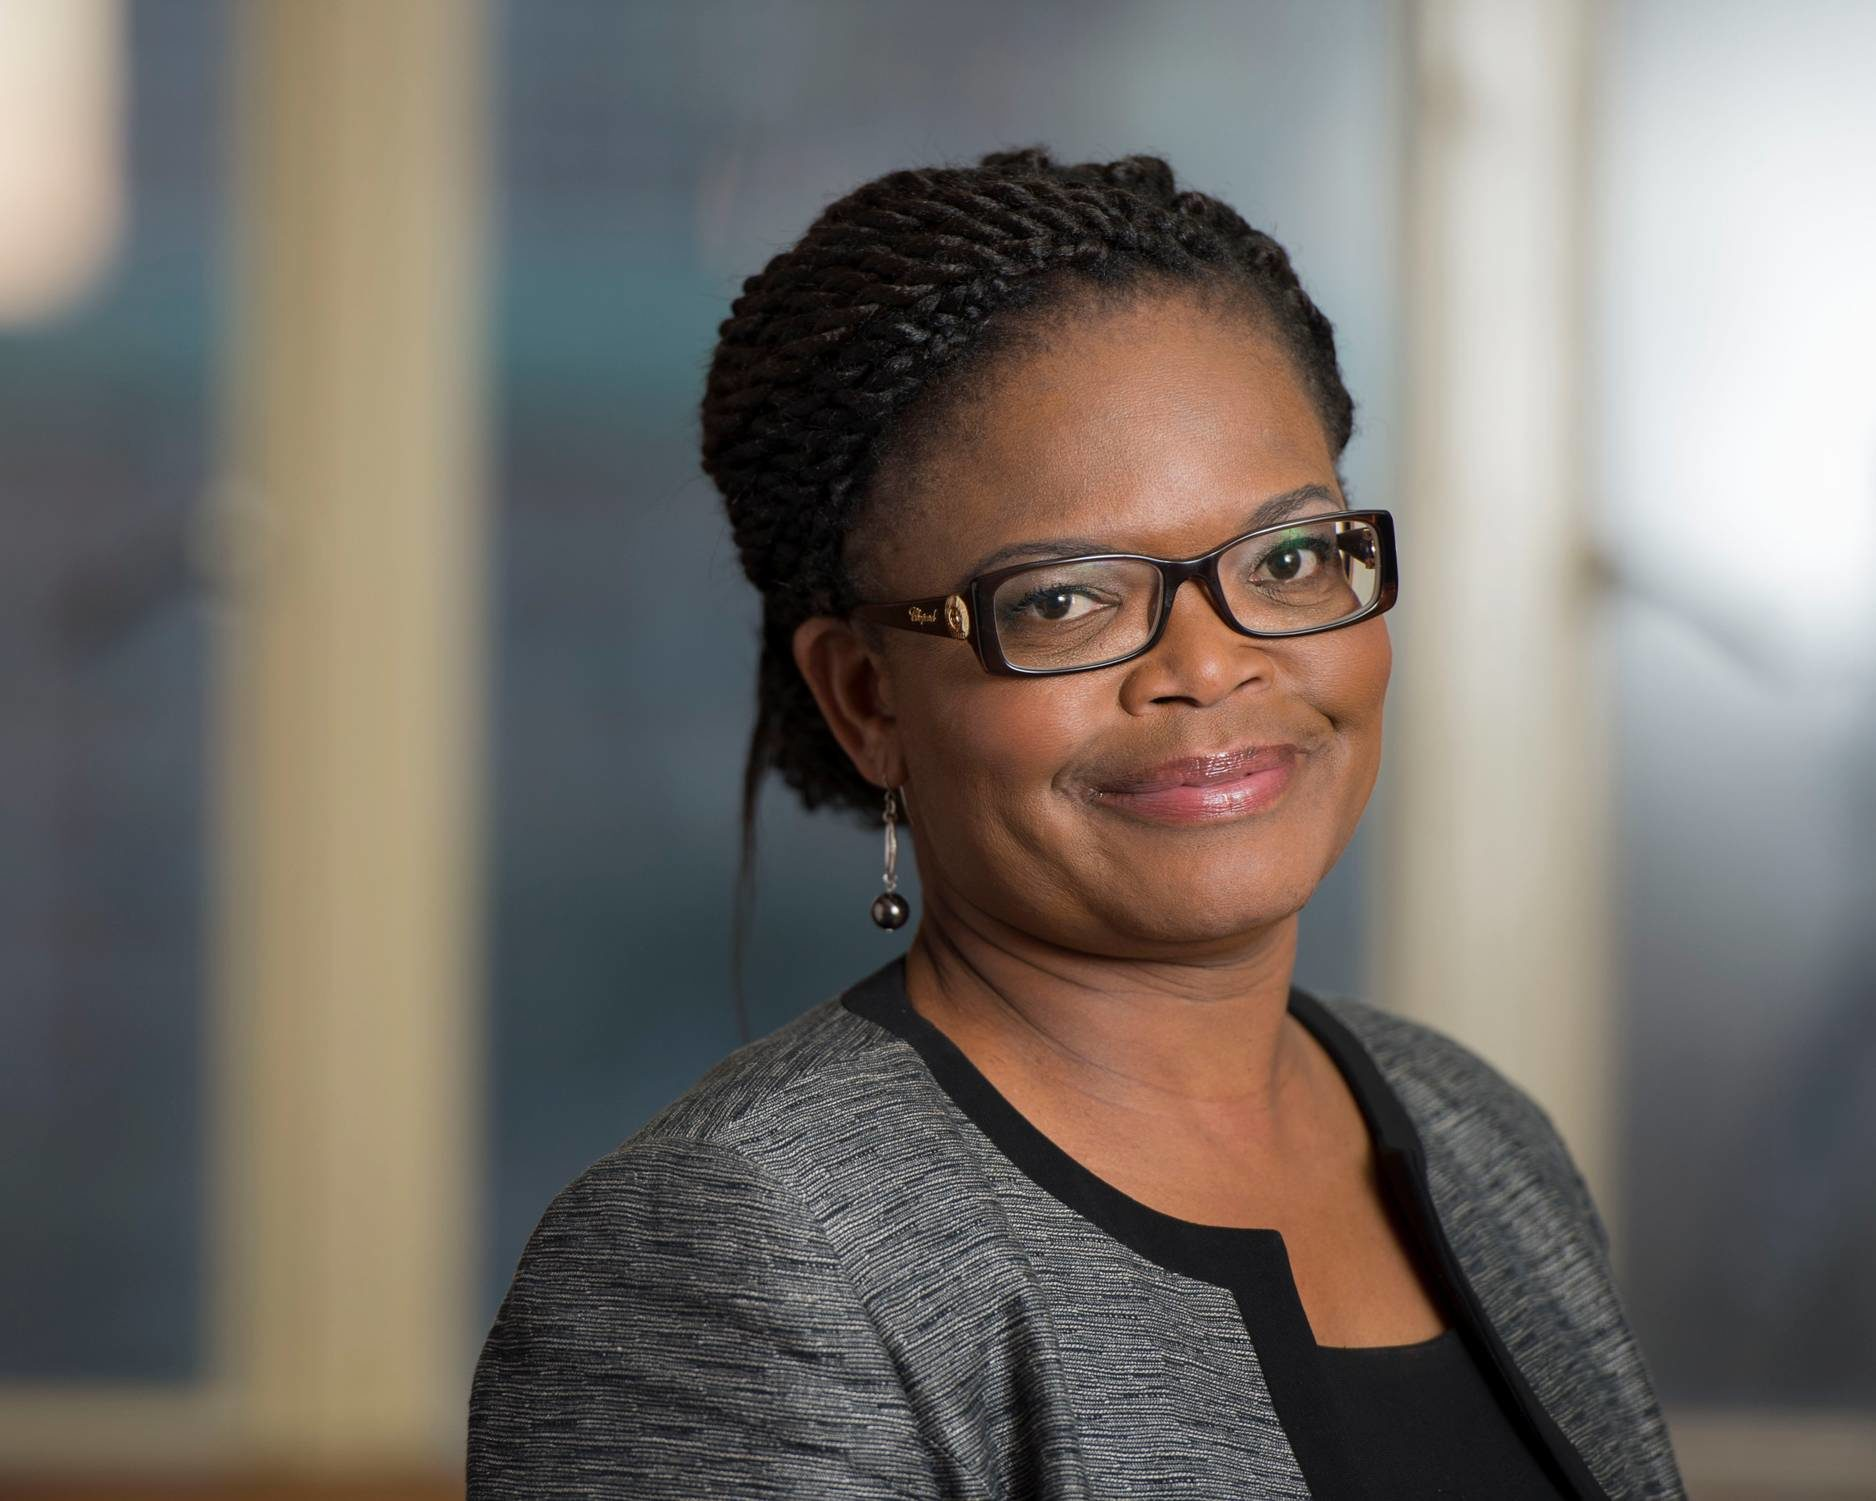 Beatrice Mtetwa